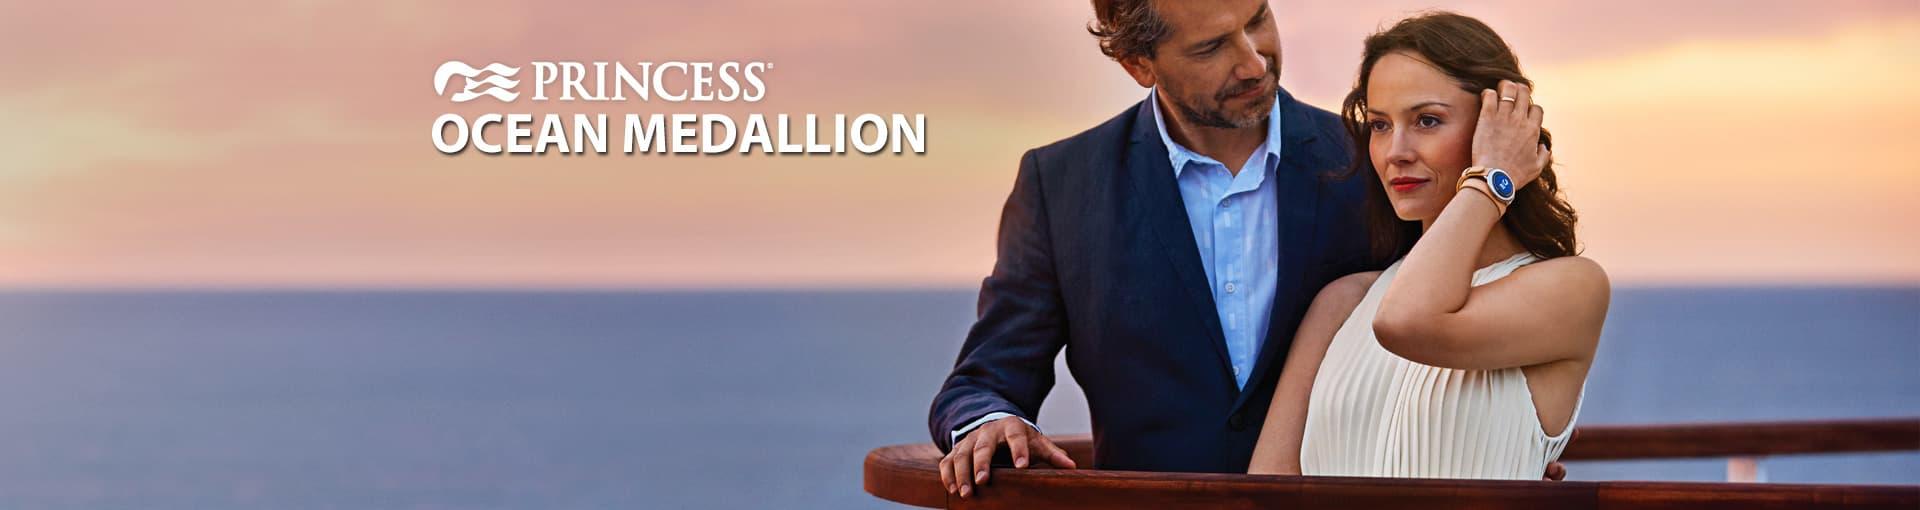 Princess Cruises - Ocean Medallion